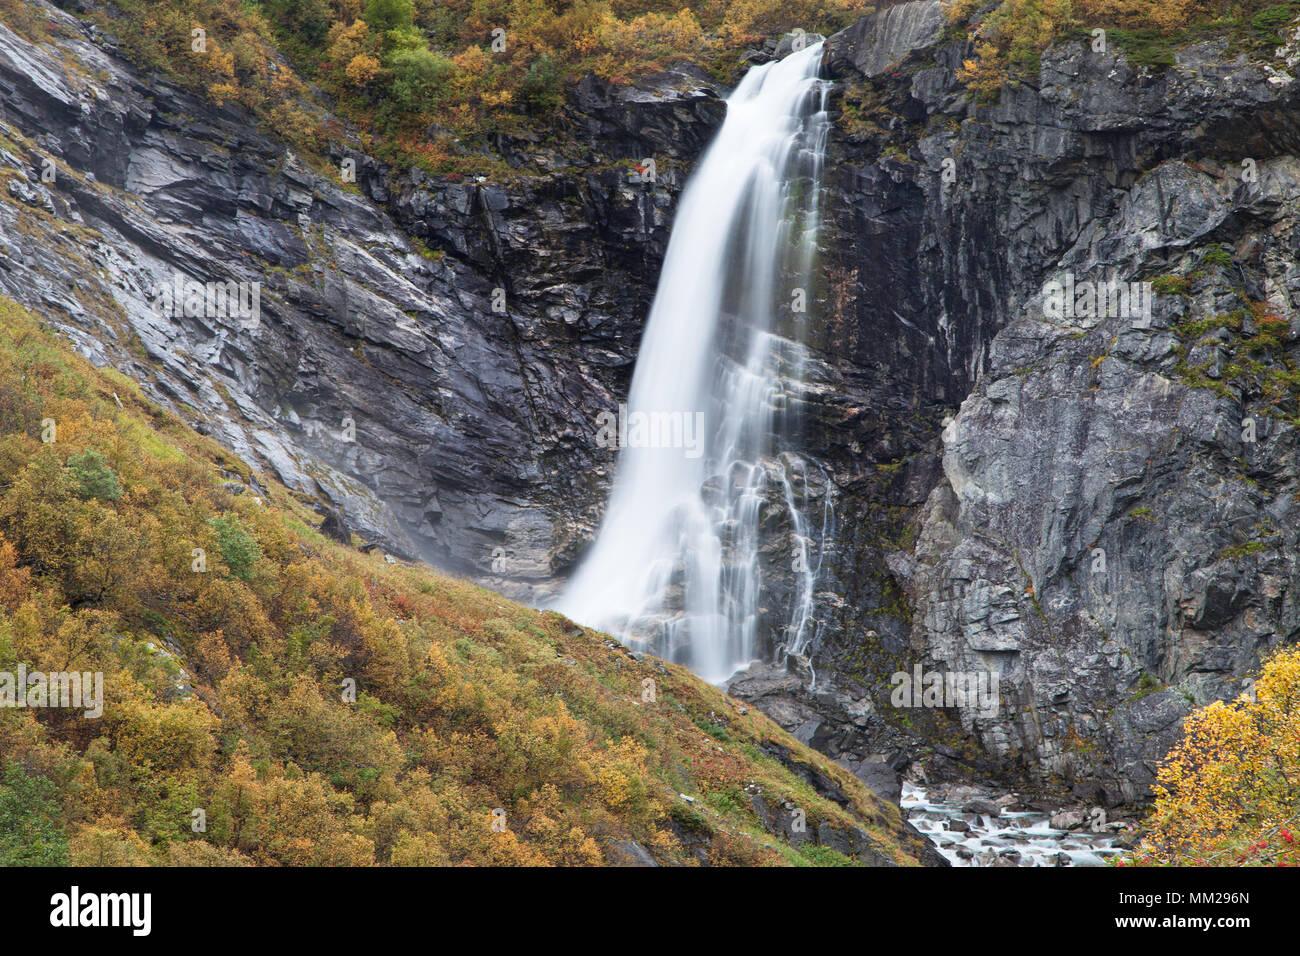 Buldrefossen Waterfall, Gamle Strynefjellsvegen, Norway. Stock Photo